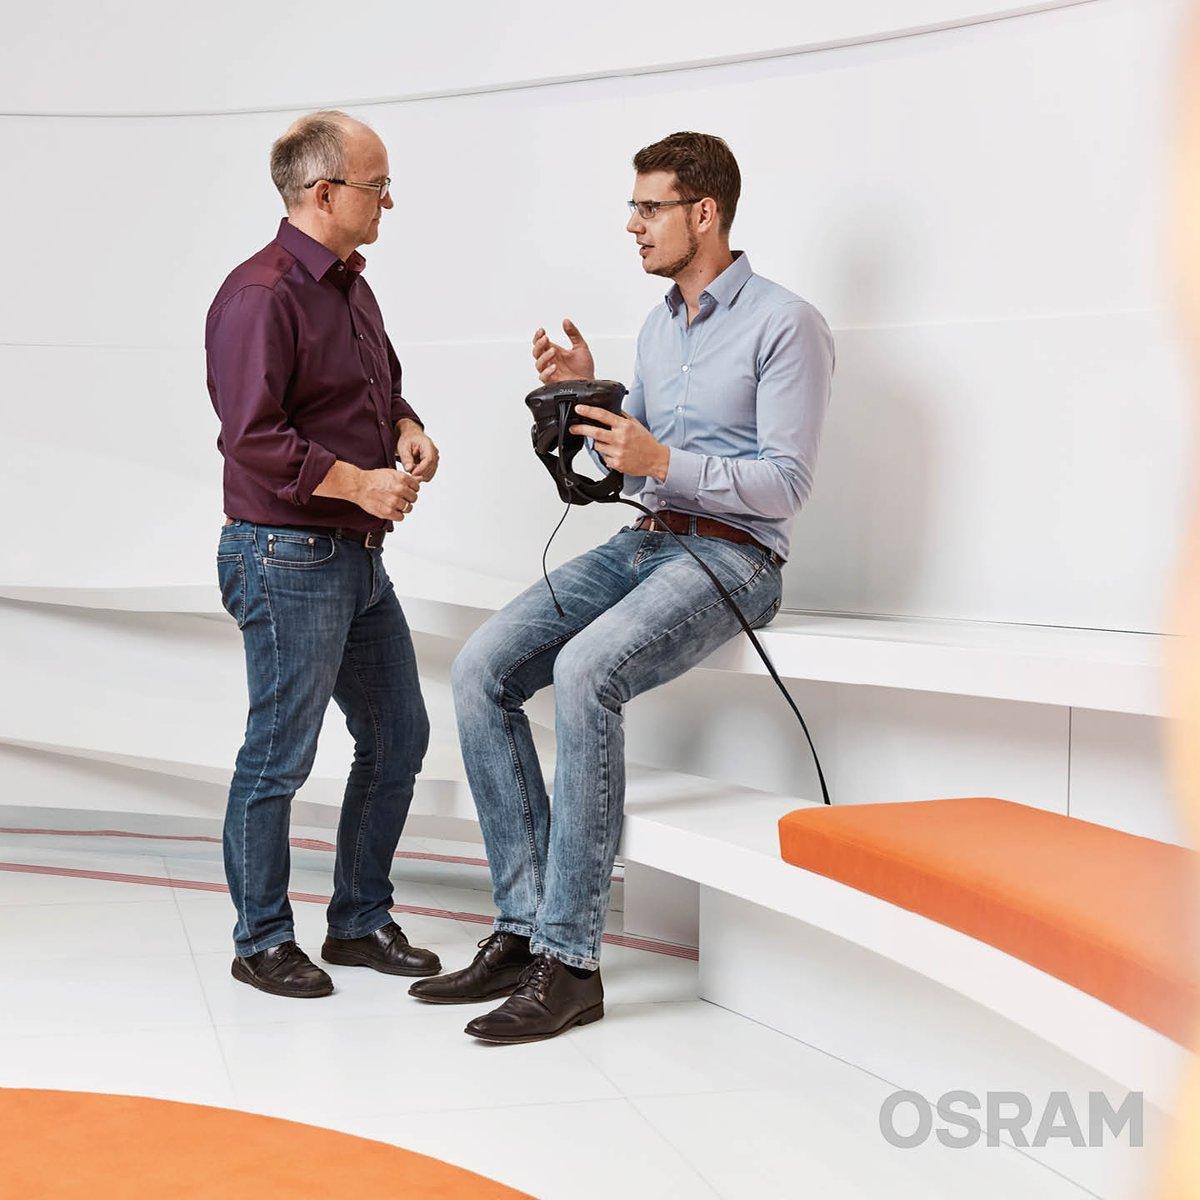 OSRAM (@OsramCOM) | Twitter